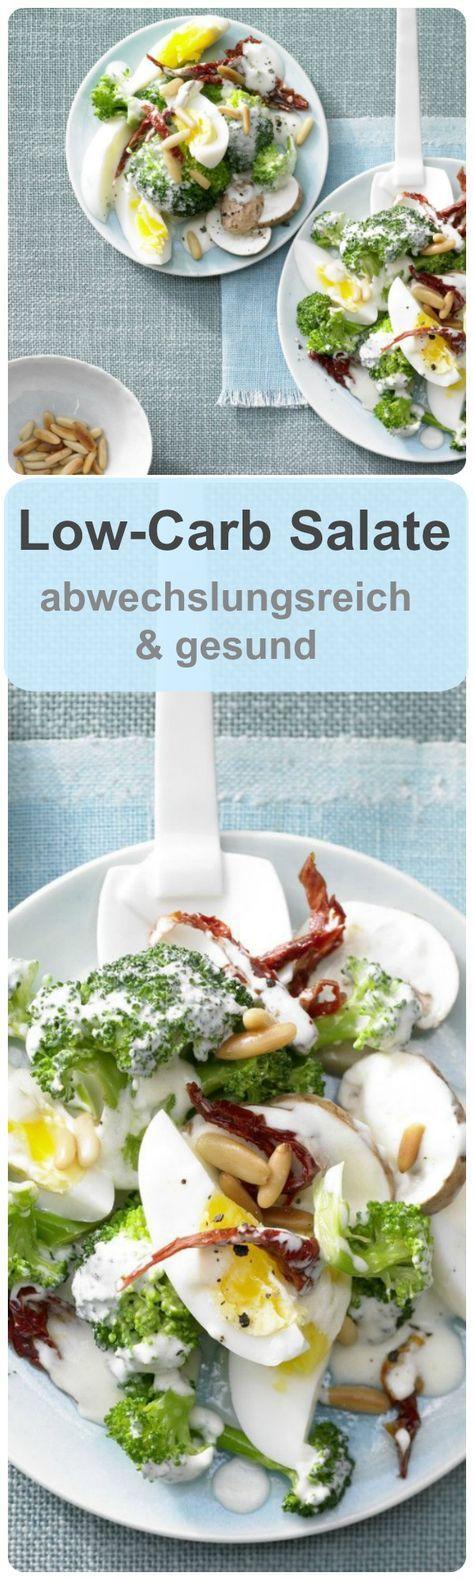 Low Carb Salate Low Carb Salat Das Buro Und Mahlzeiten